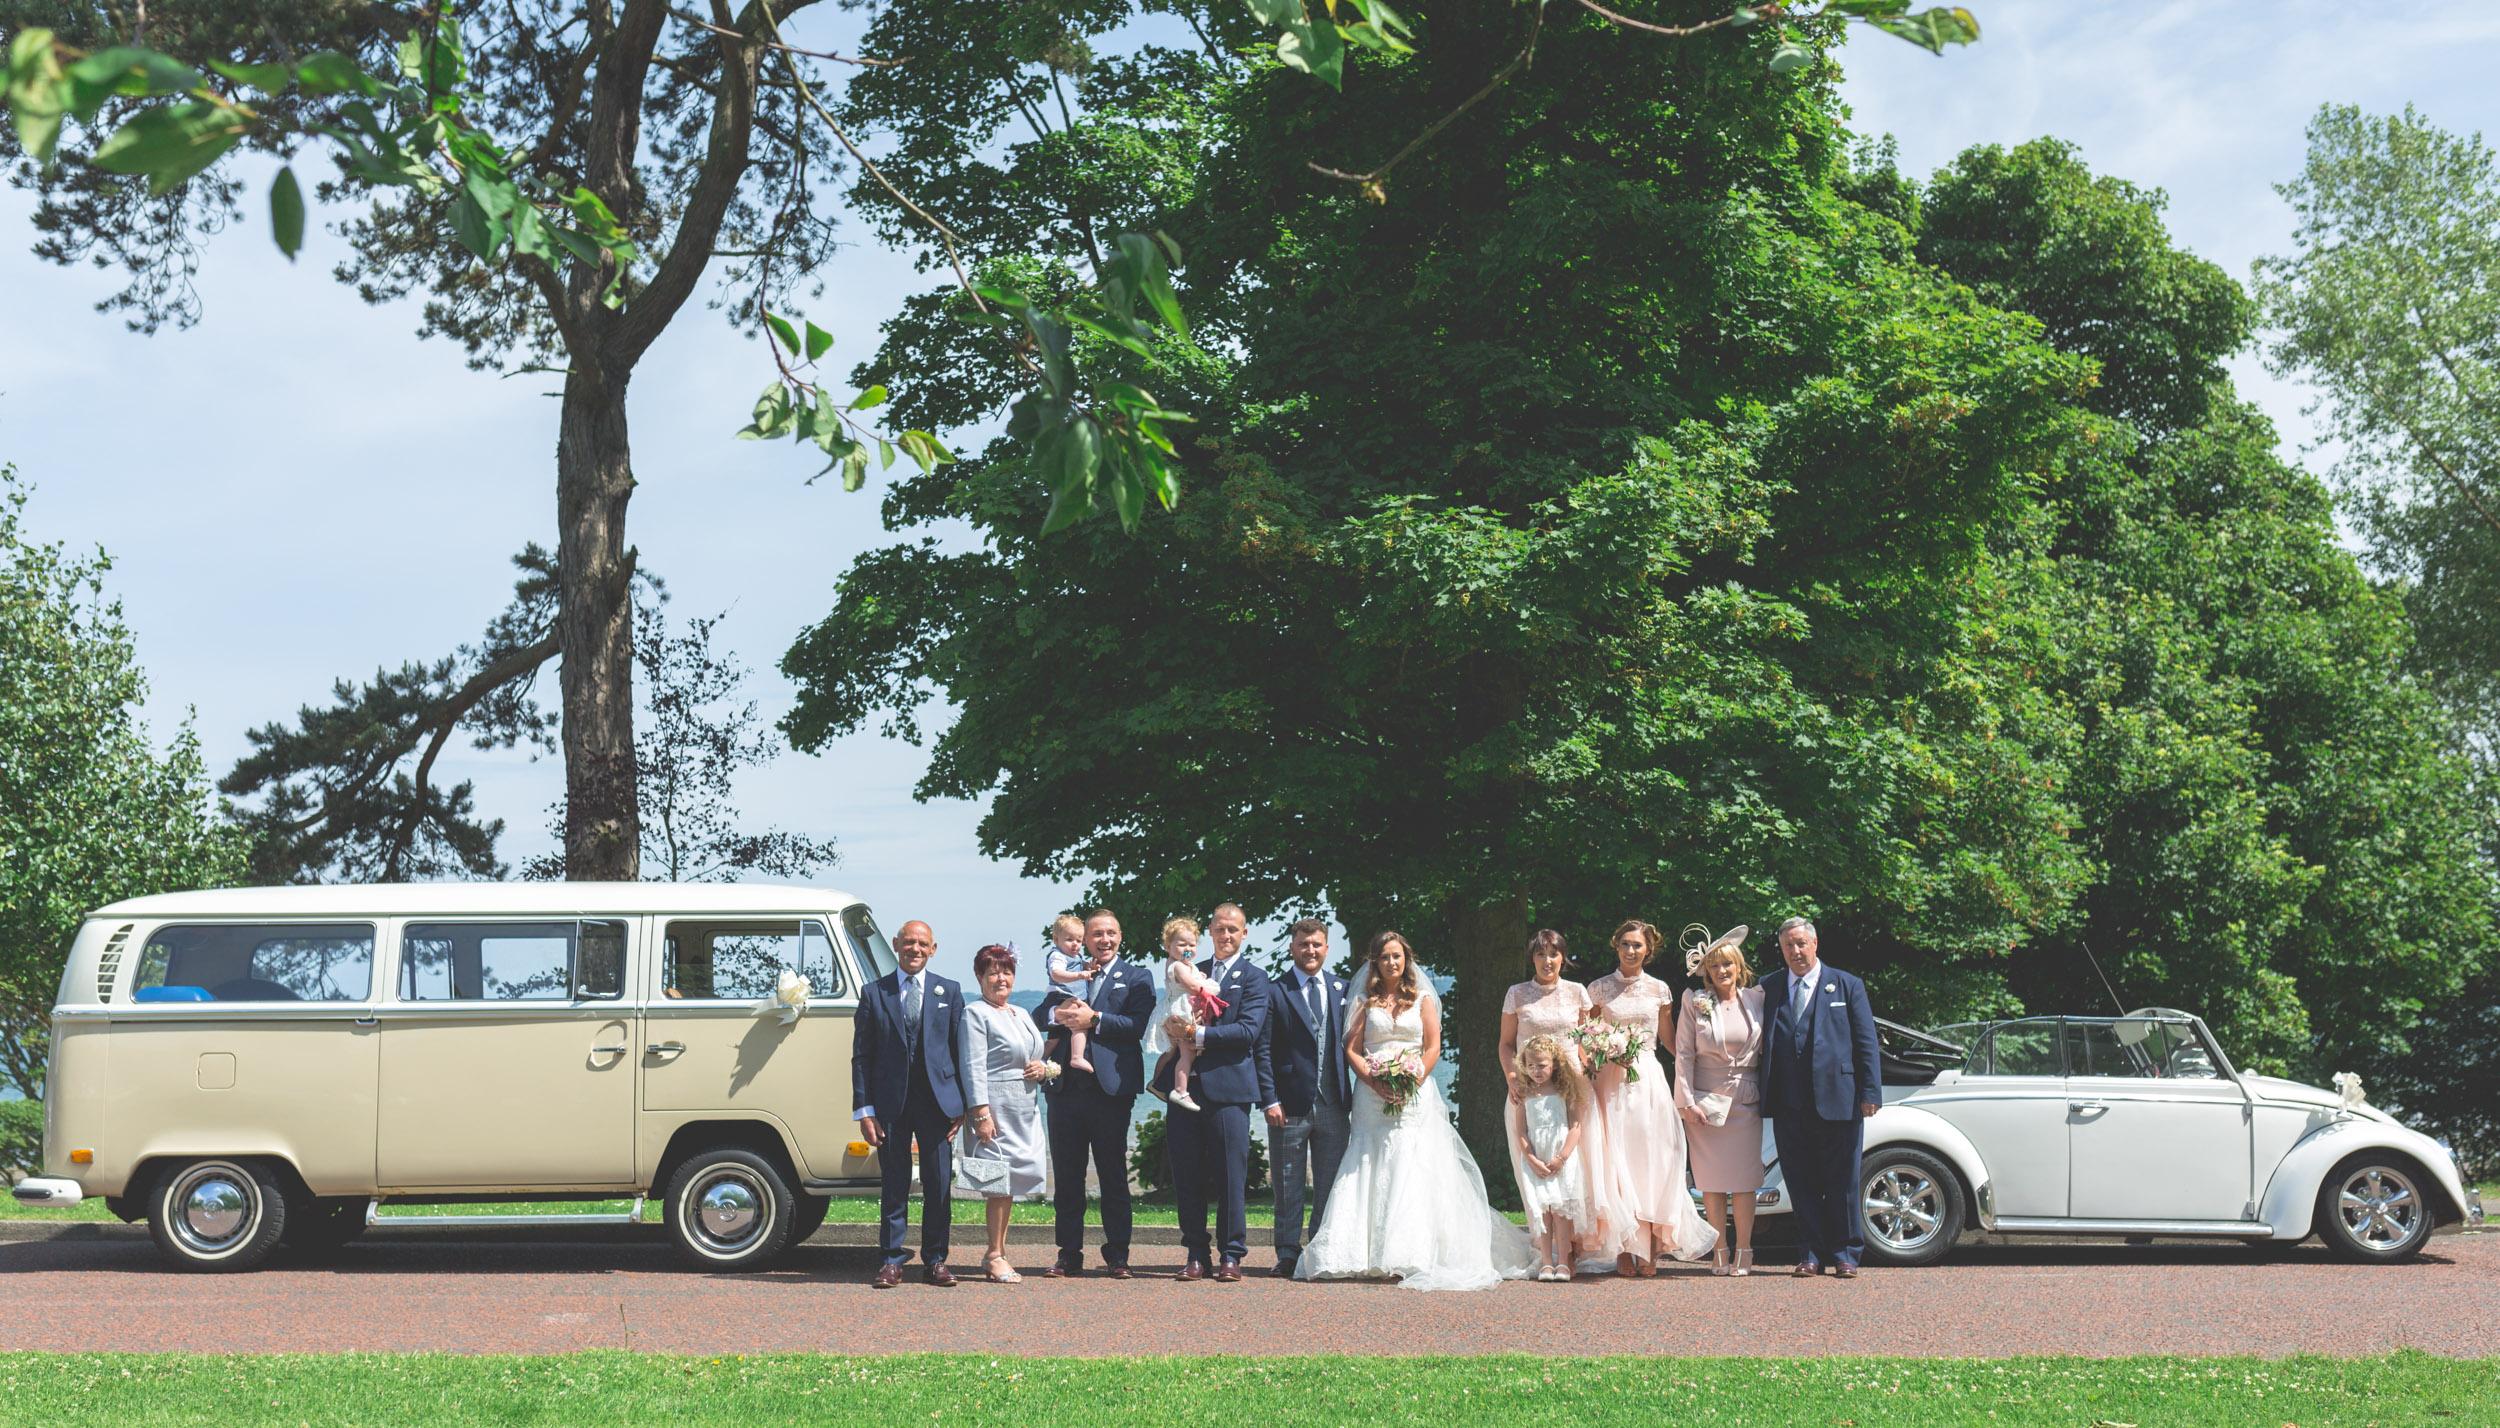 Brian McEwan   Northern Ireland Wedding Photographer   Rebecca & Michael   Portraits-4.jpg